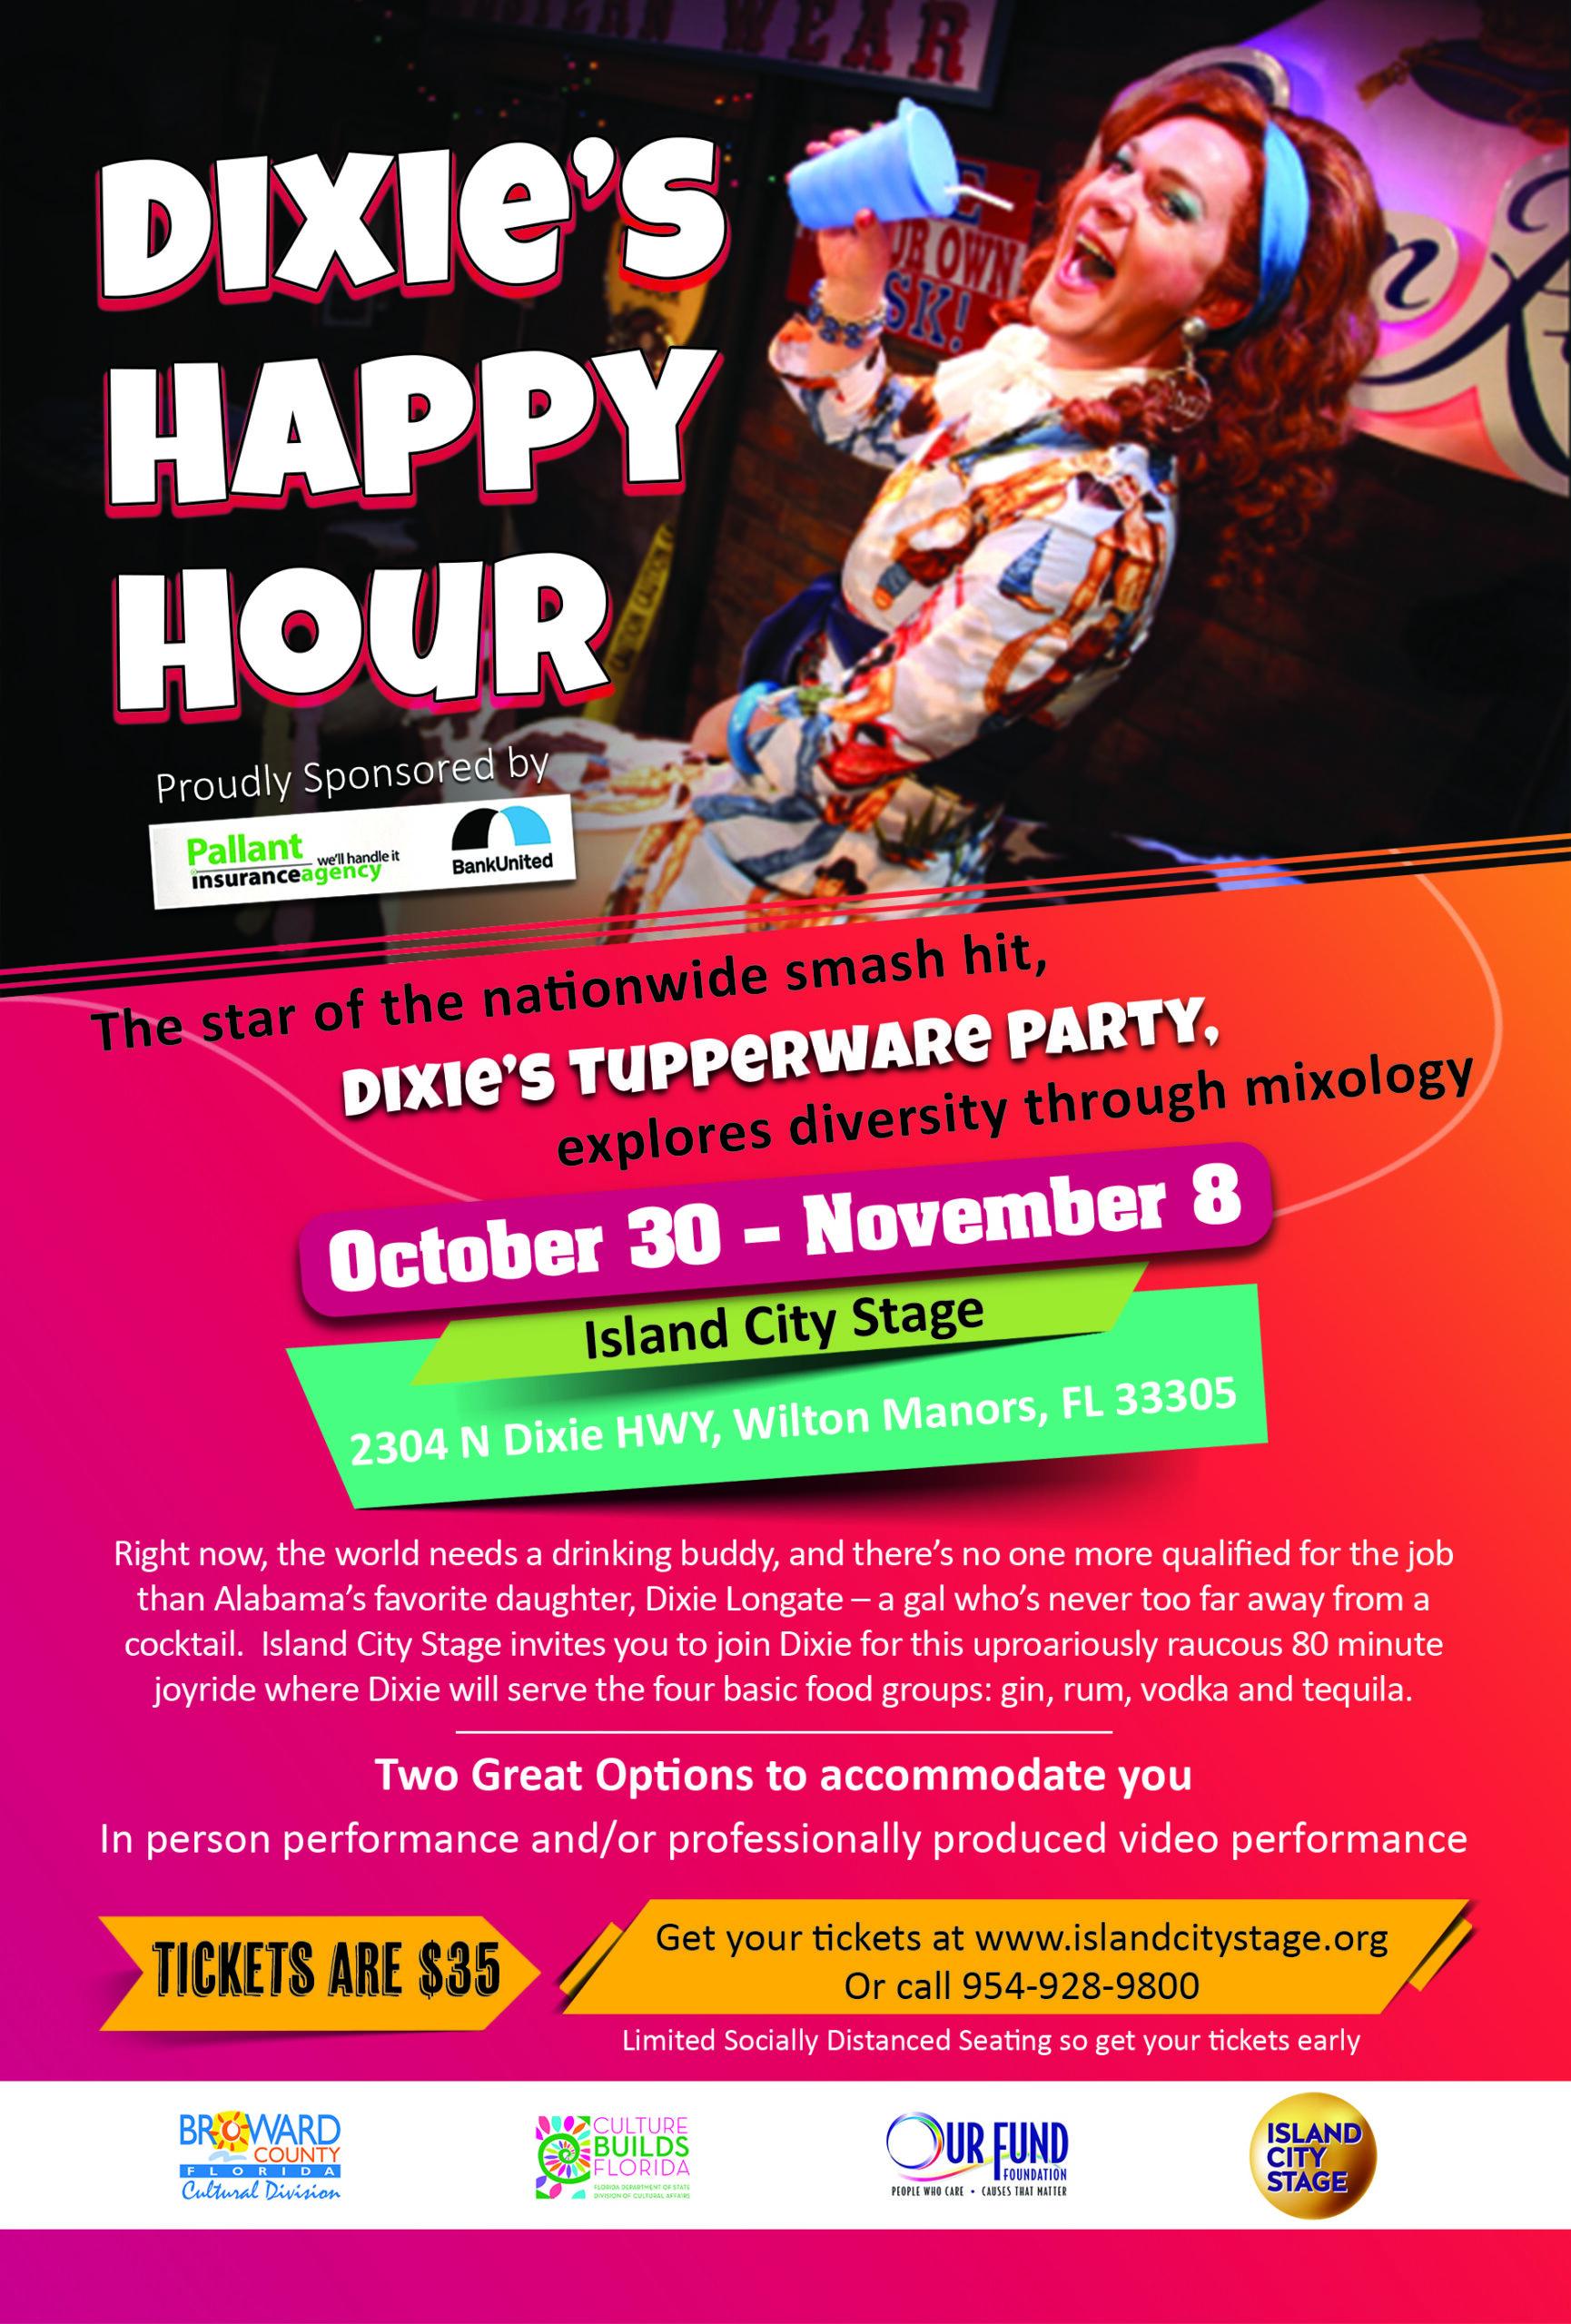 Dixie's Happy Hour, Tupperware Party